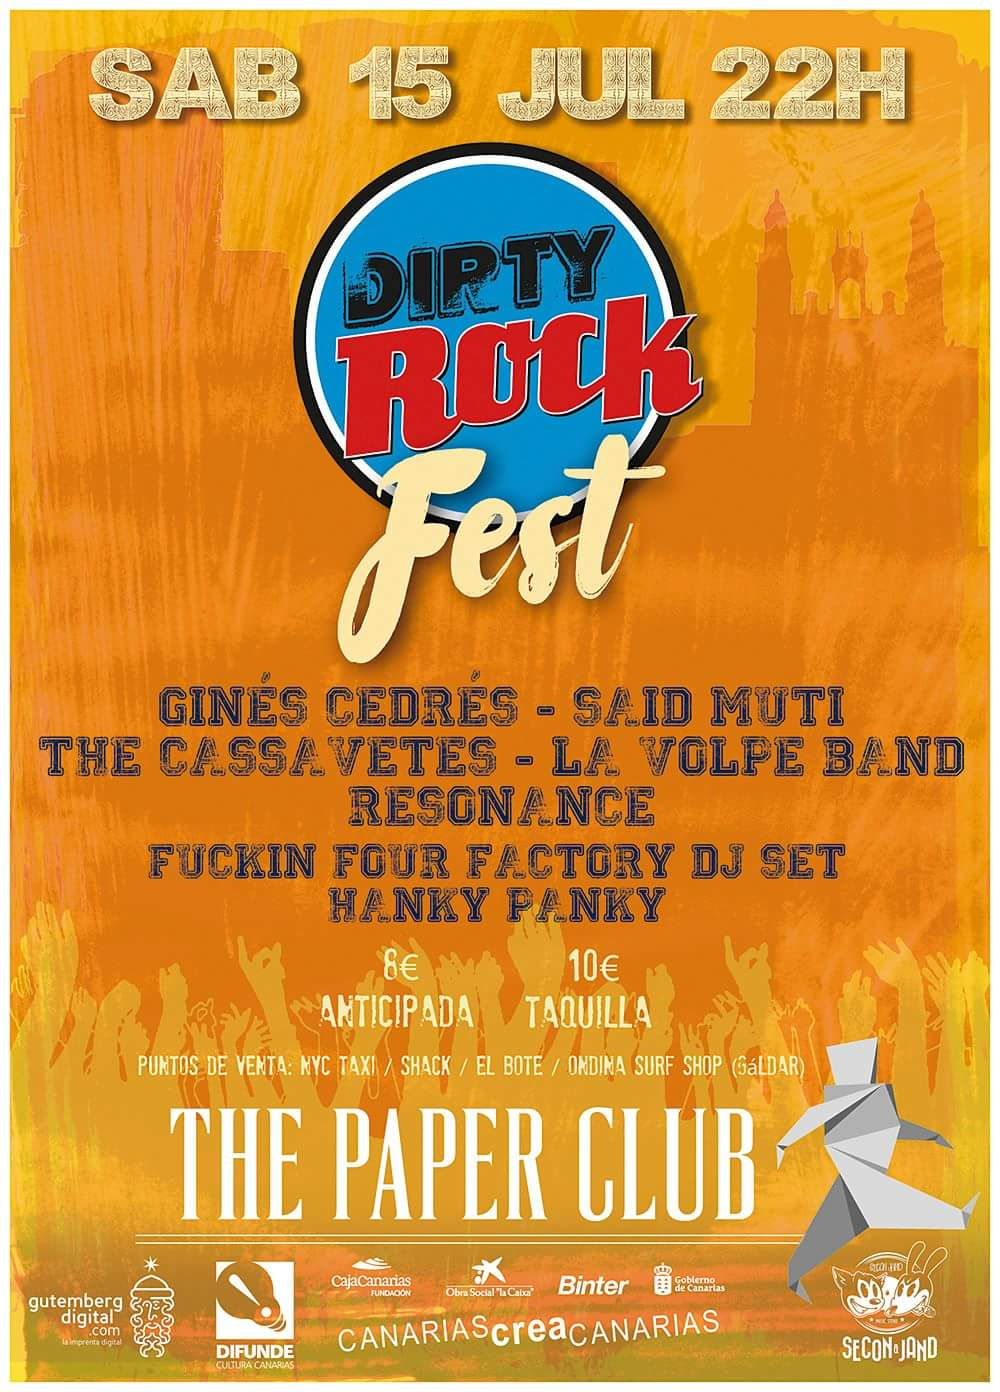 Dirty Rock Fest